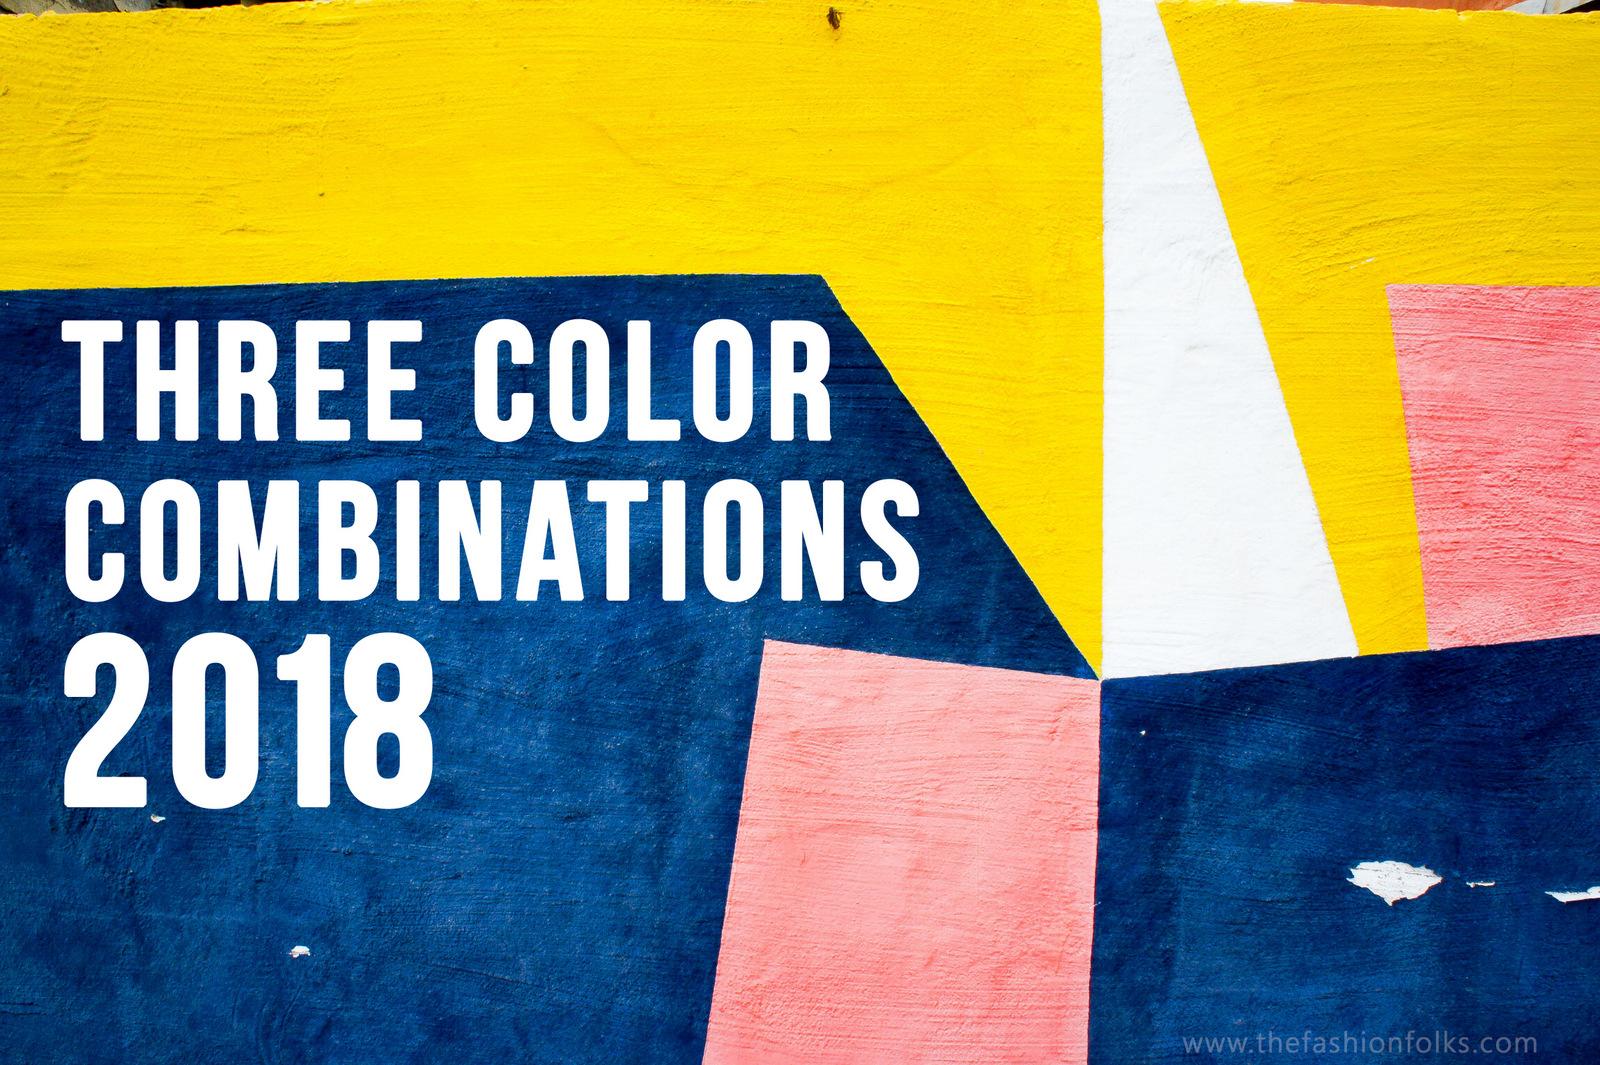 Three Color Combinations 2018